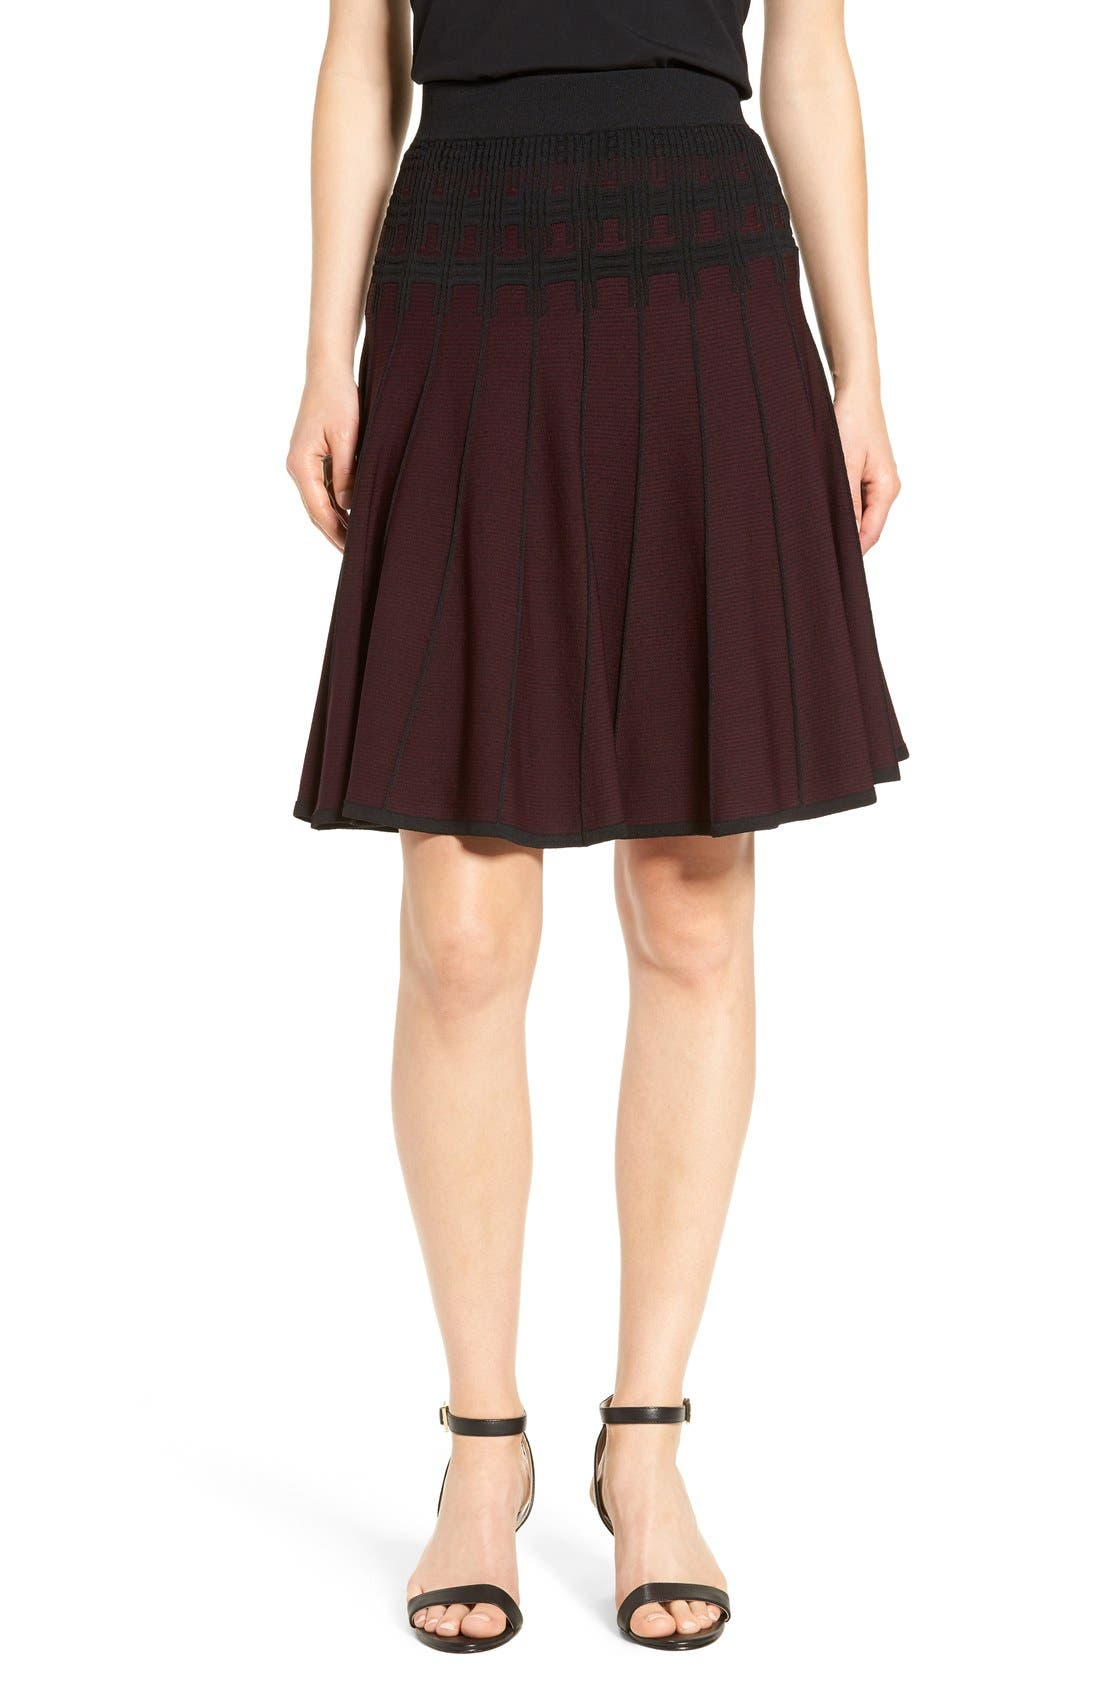 Alternate Image 1 Selected - Ivanka Trump Jacquard Knit Flare Skirt